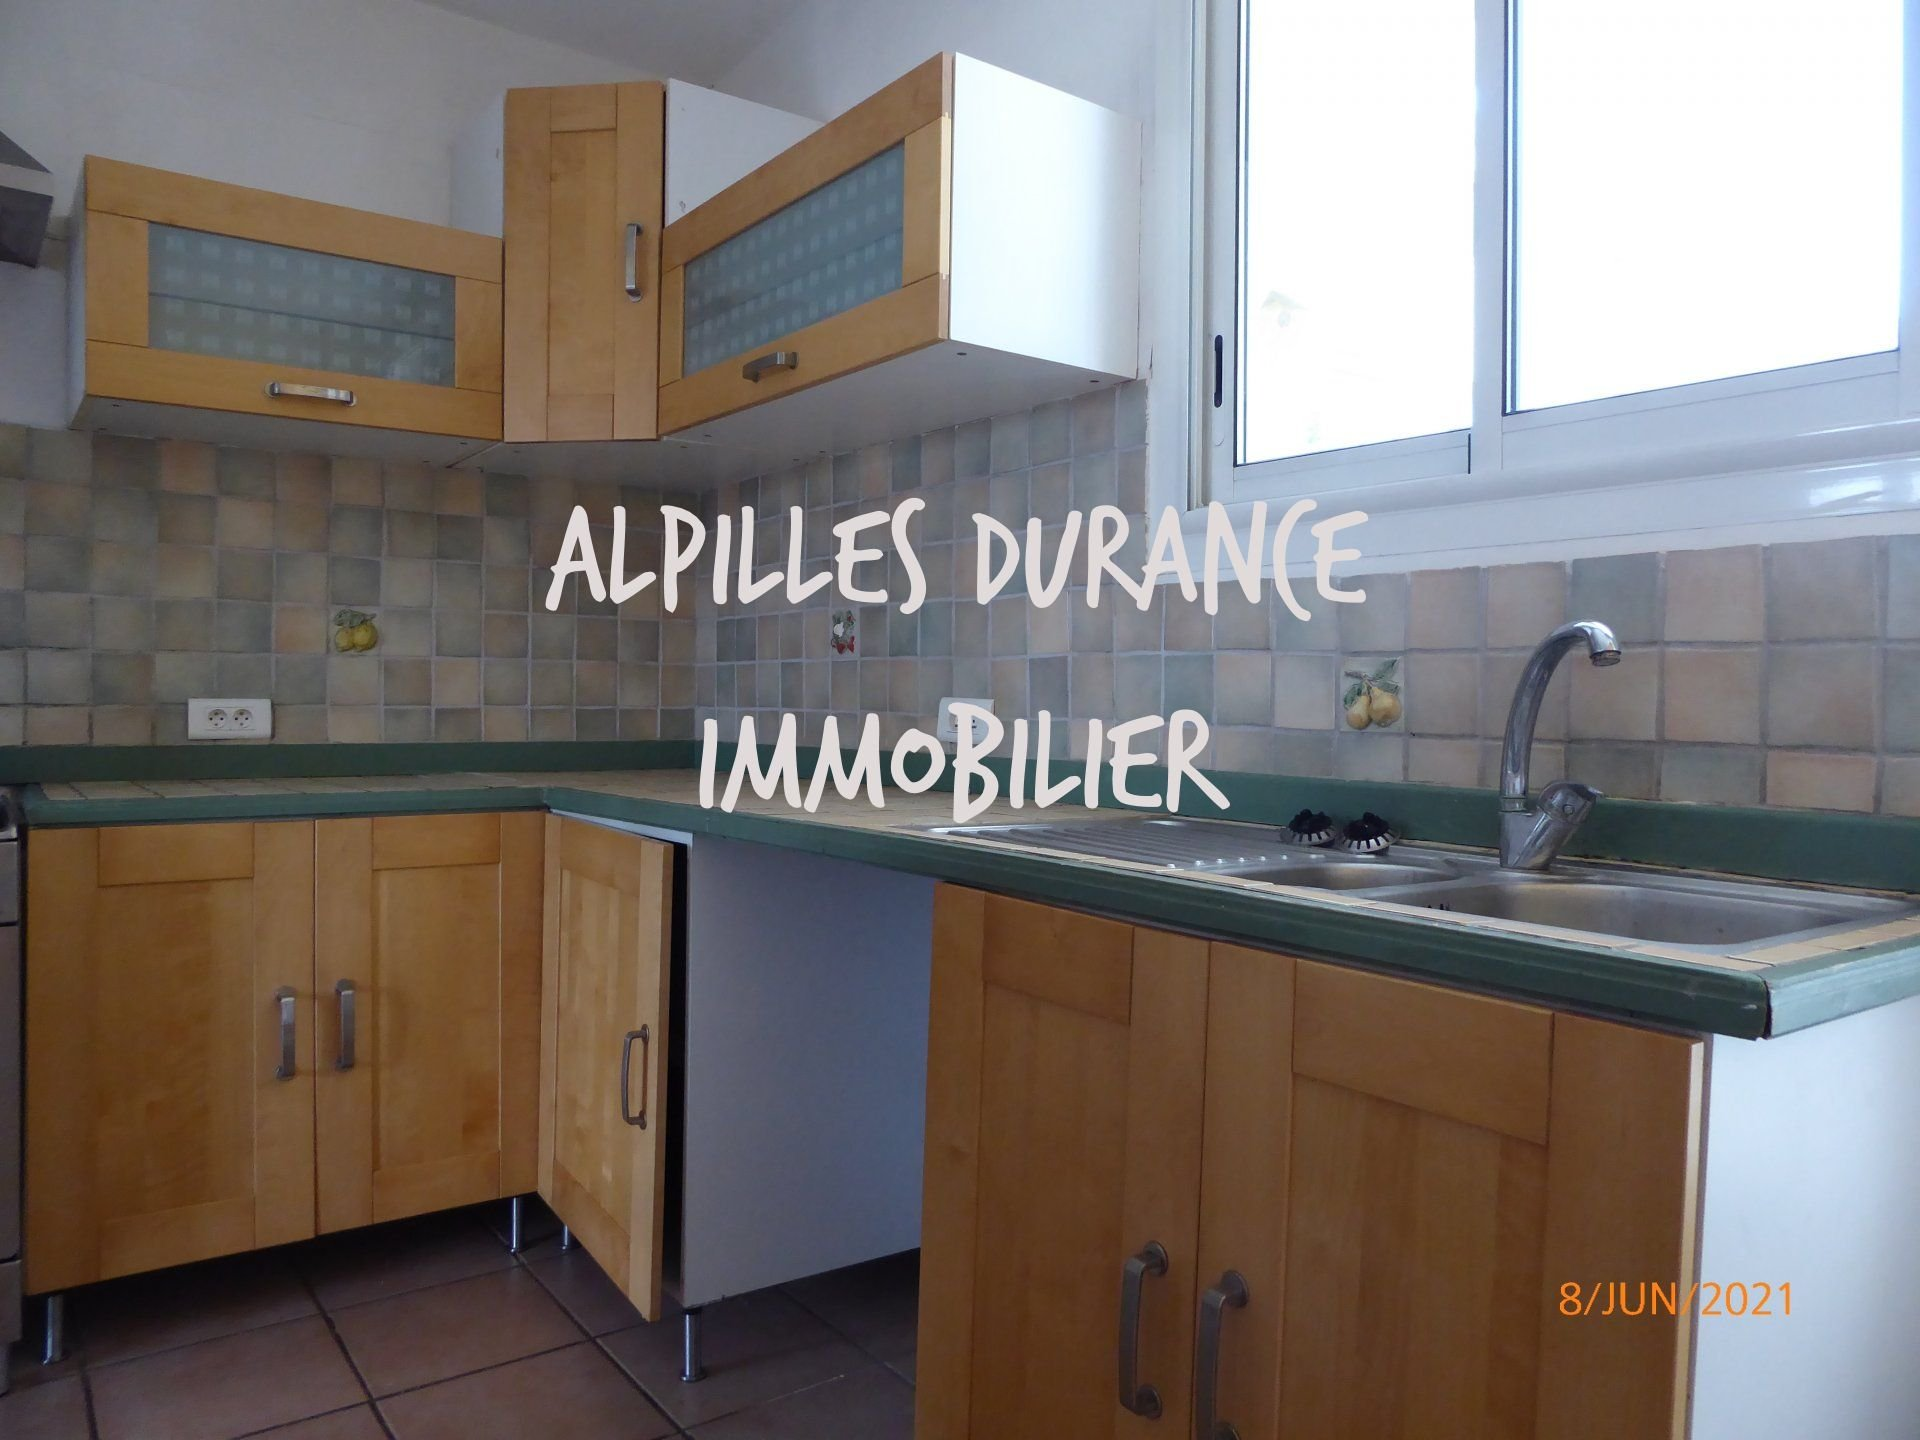 Saint-Andiol: Apartment of type 4